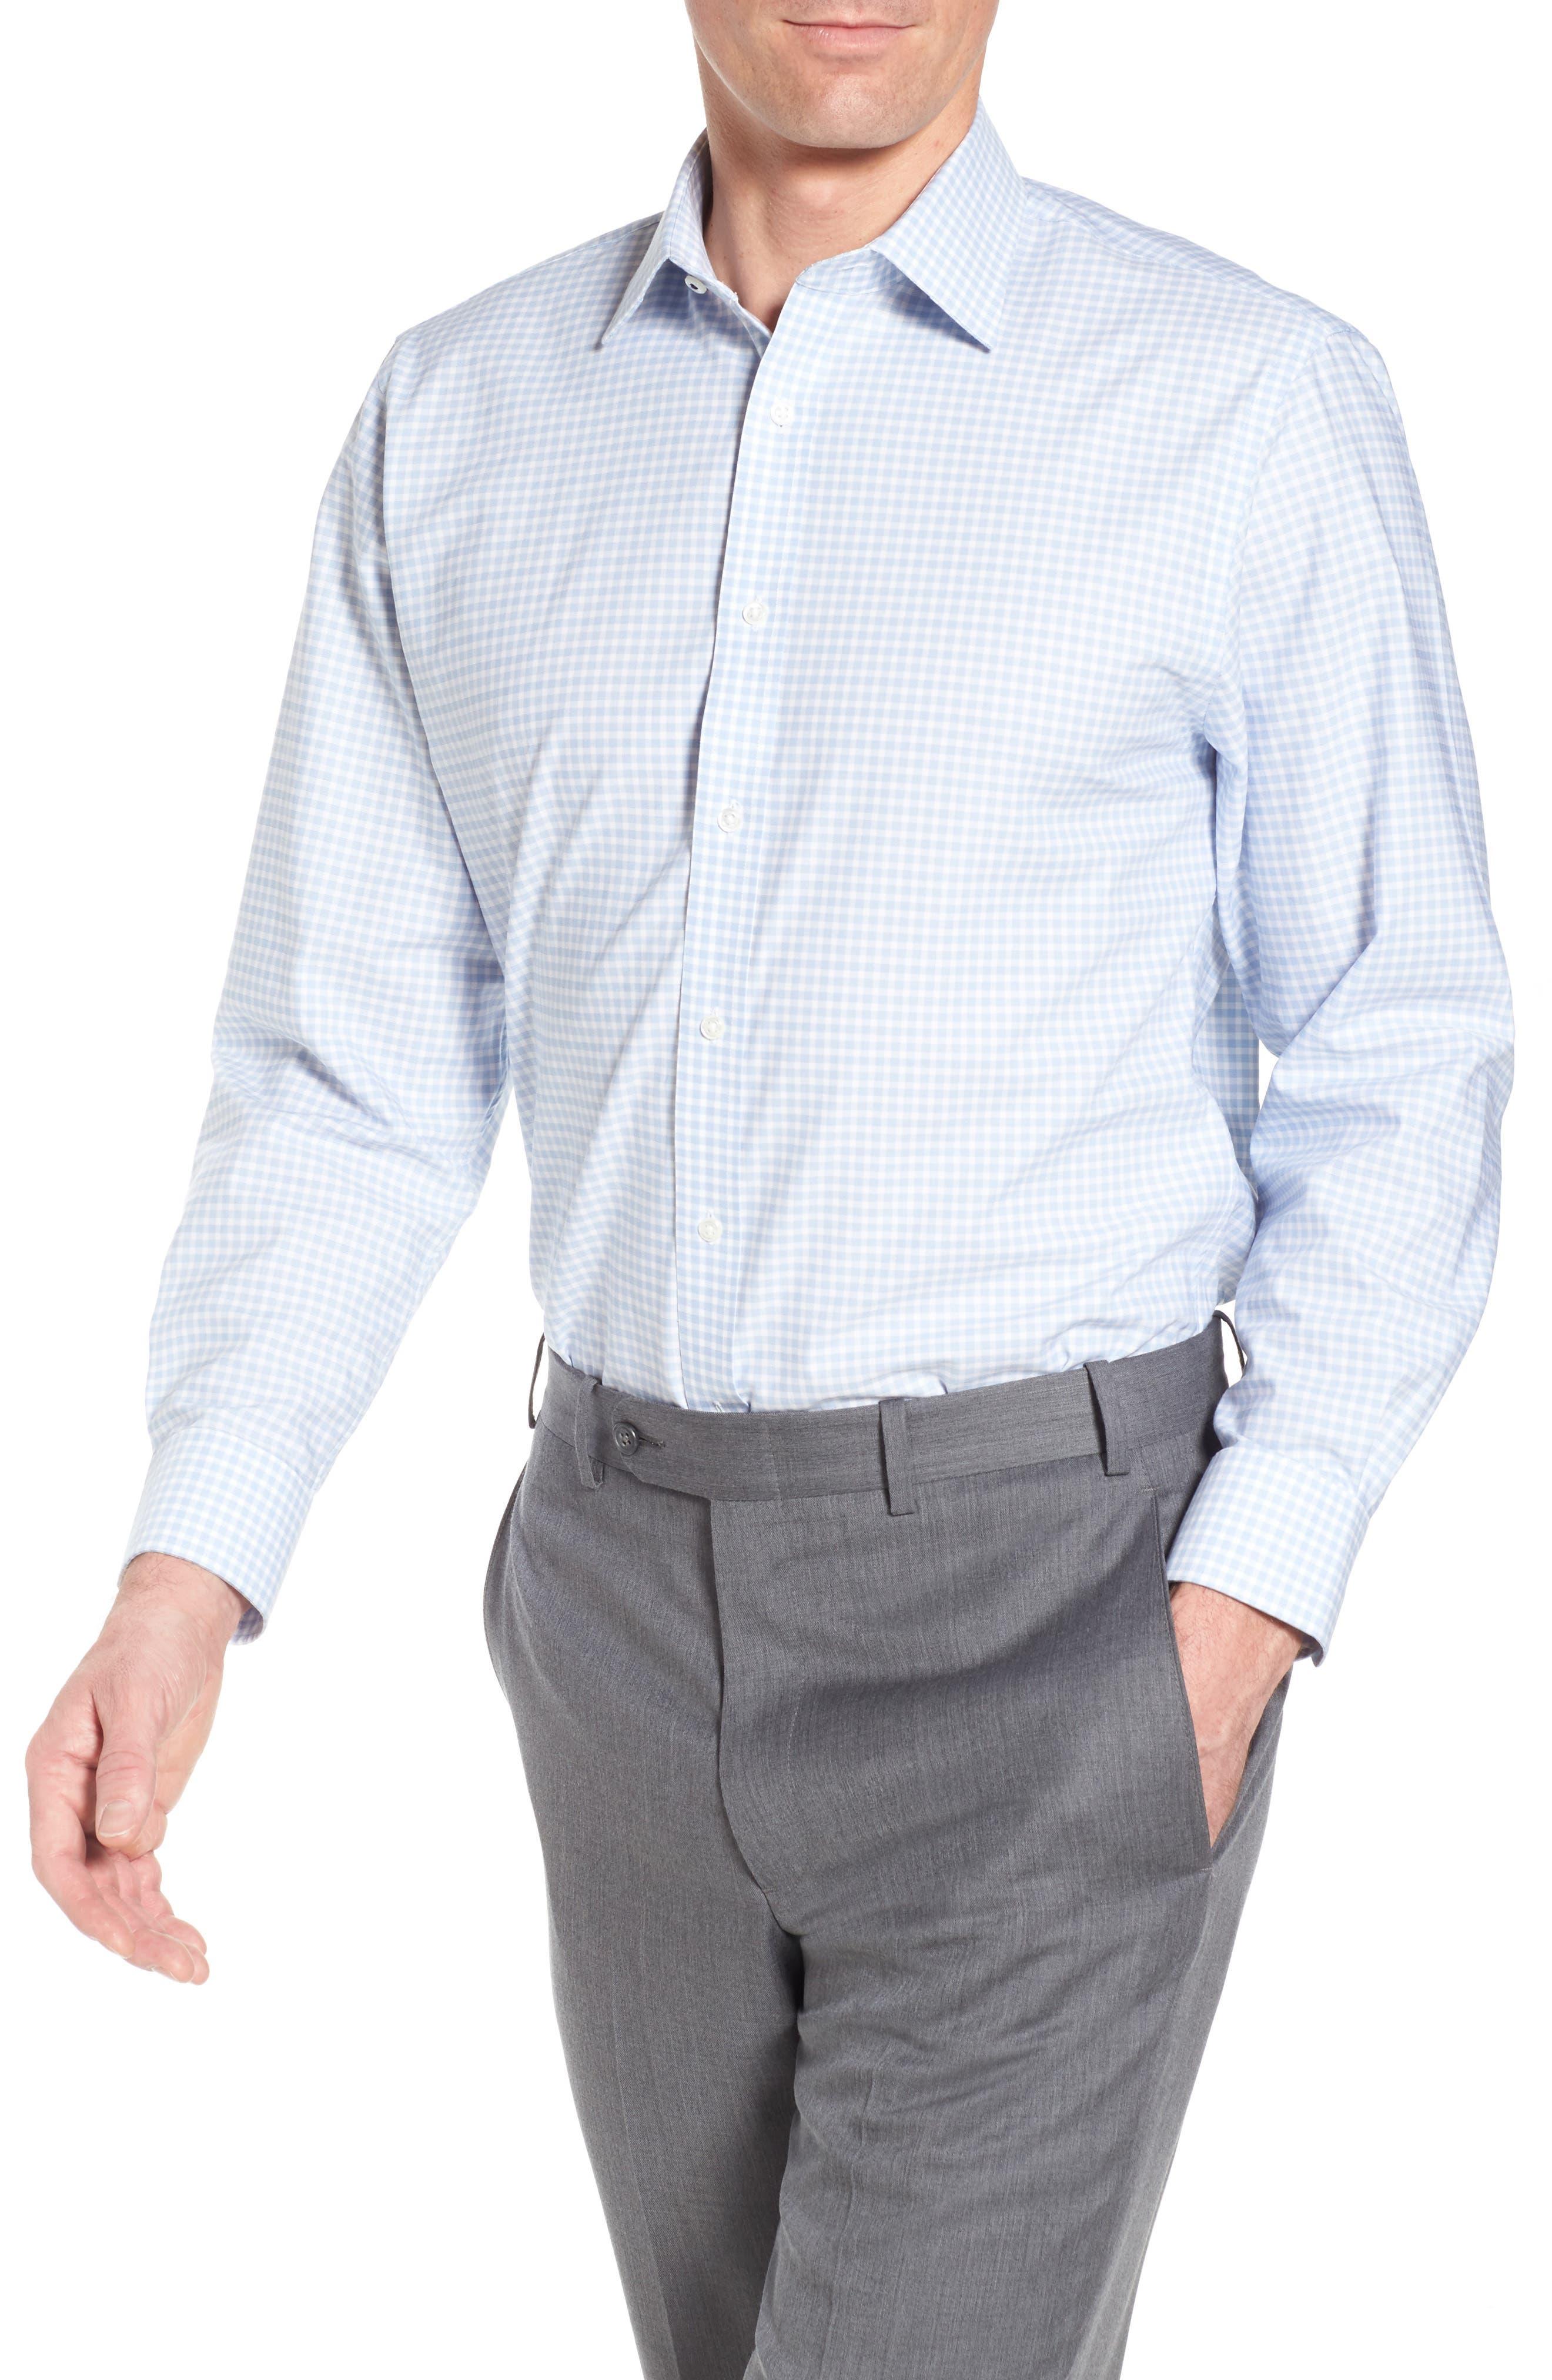 Main Image - Nordstrom Men's Shop Tech-Smart Traditional Fit Stretch Check Dress Shirt